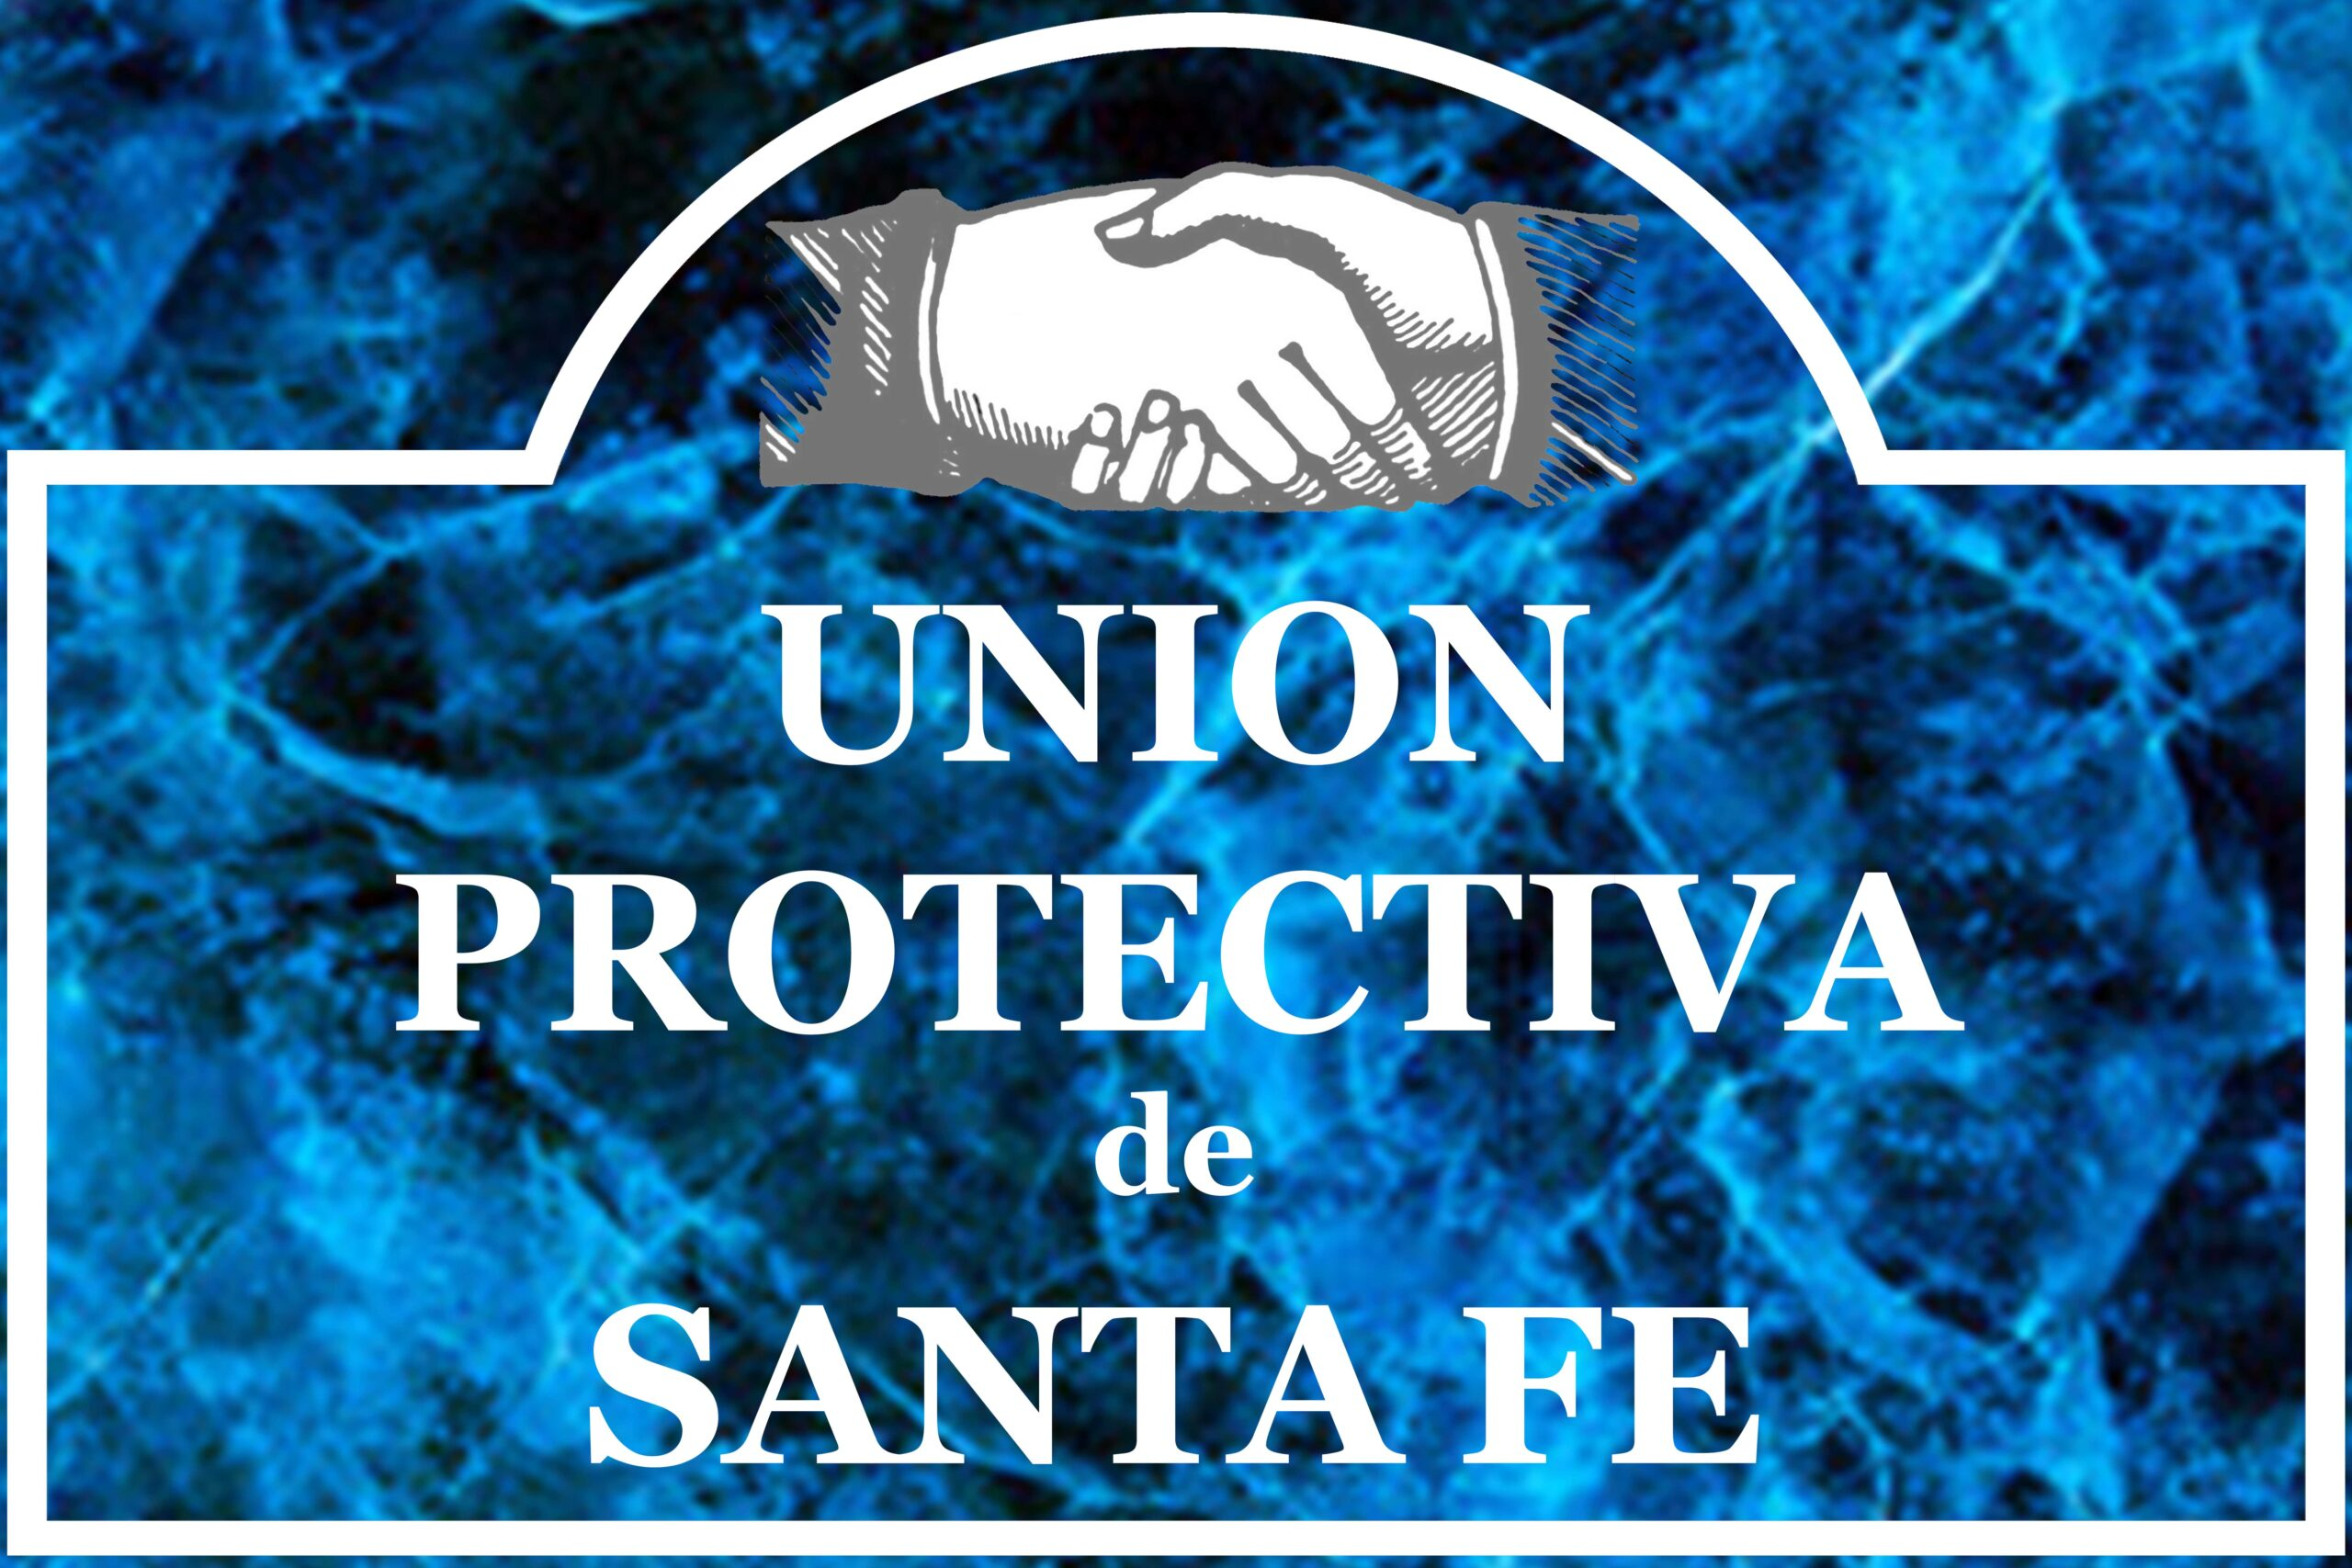 Union Protectiva de Santa Fe Nuevo Mejico